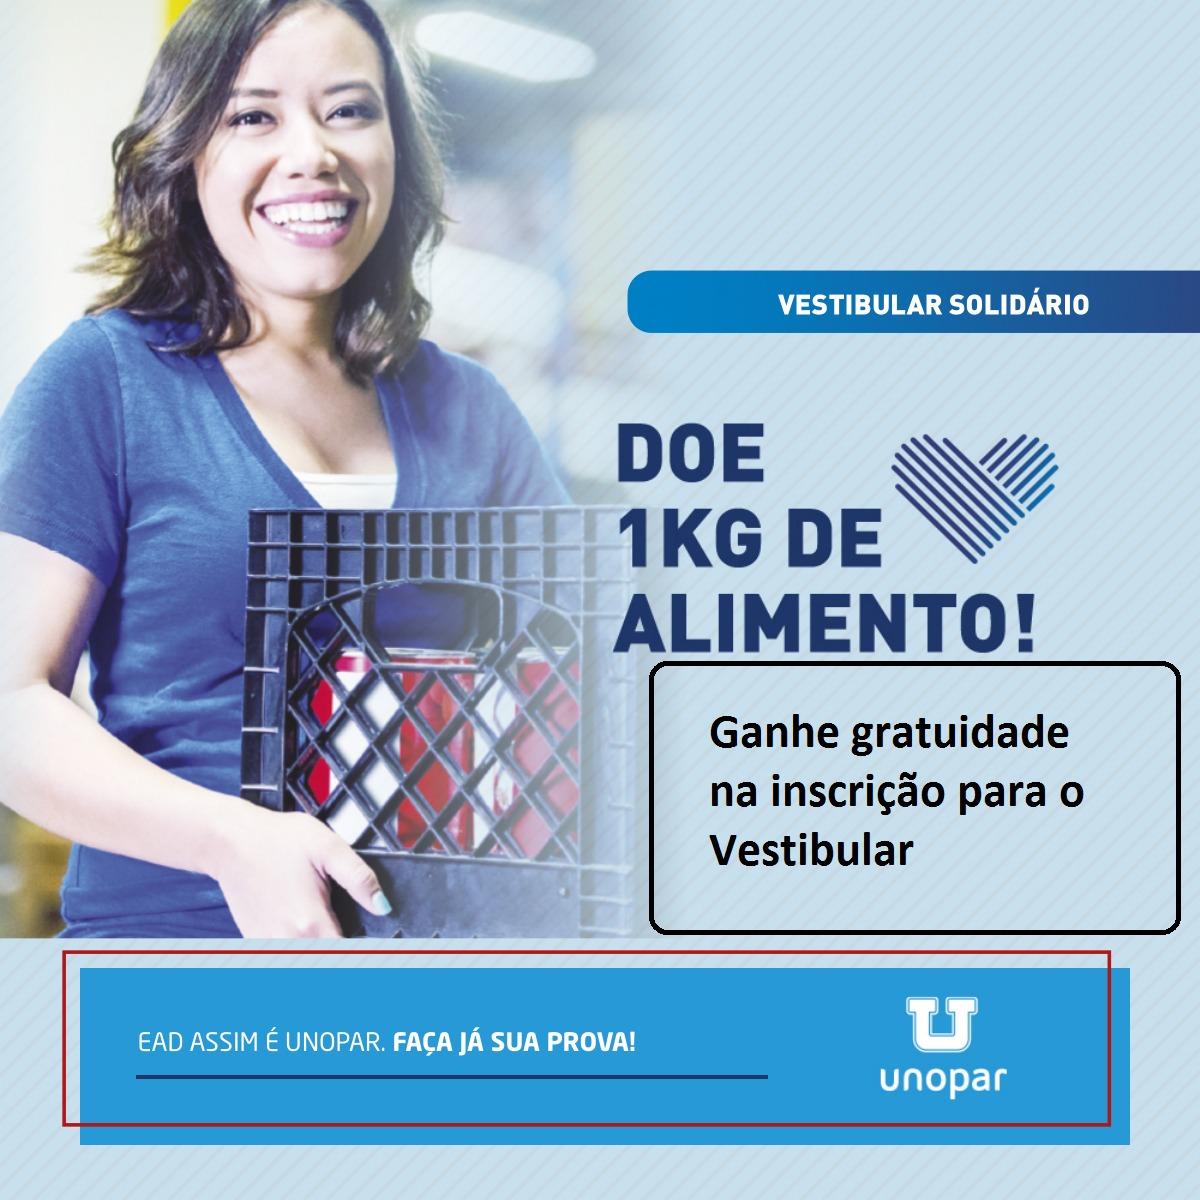 Unopar EAD São Luiz Gonzaga